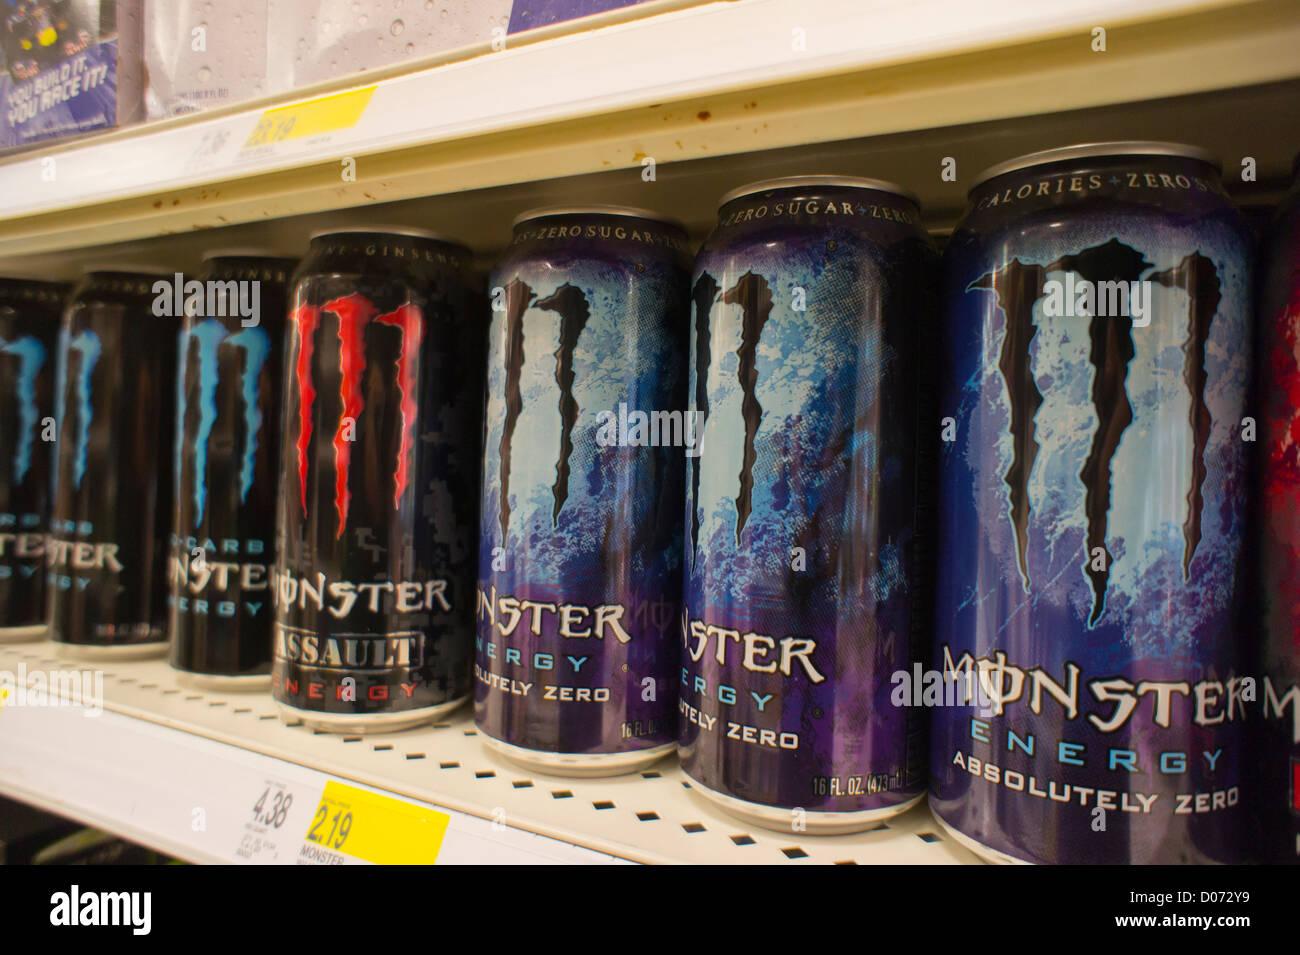 Energy Drinks Store Stockfotos & Energy Drinks Store Bilder - Alamy